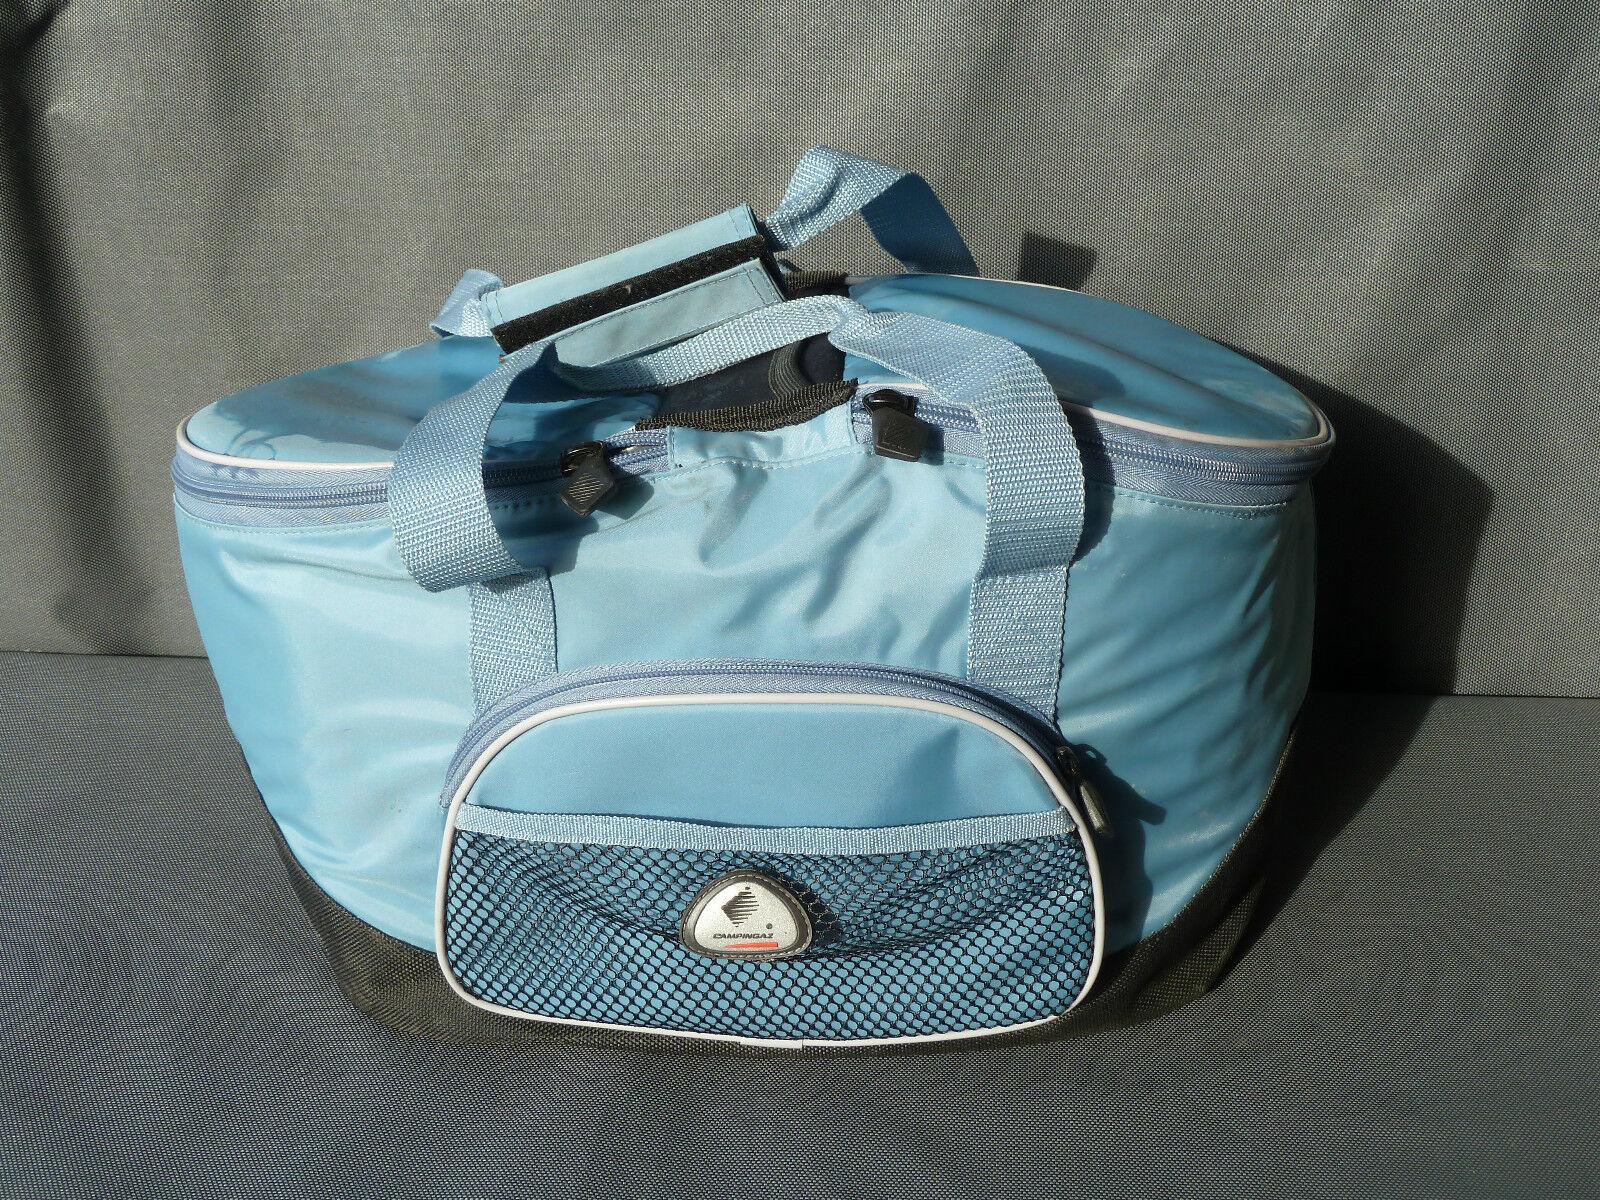 Ex borsa Campin Cooler gaz, cestino popolare pic-nic art popolare cestino antico francese 6379d1